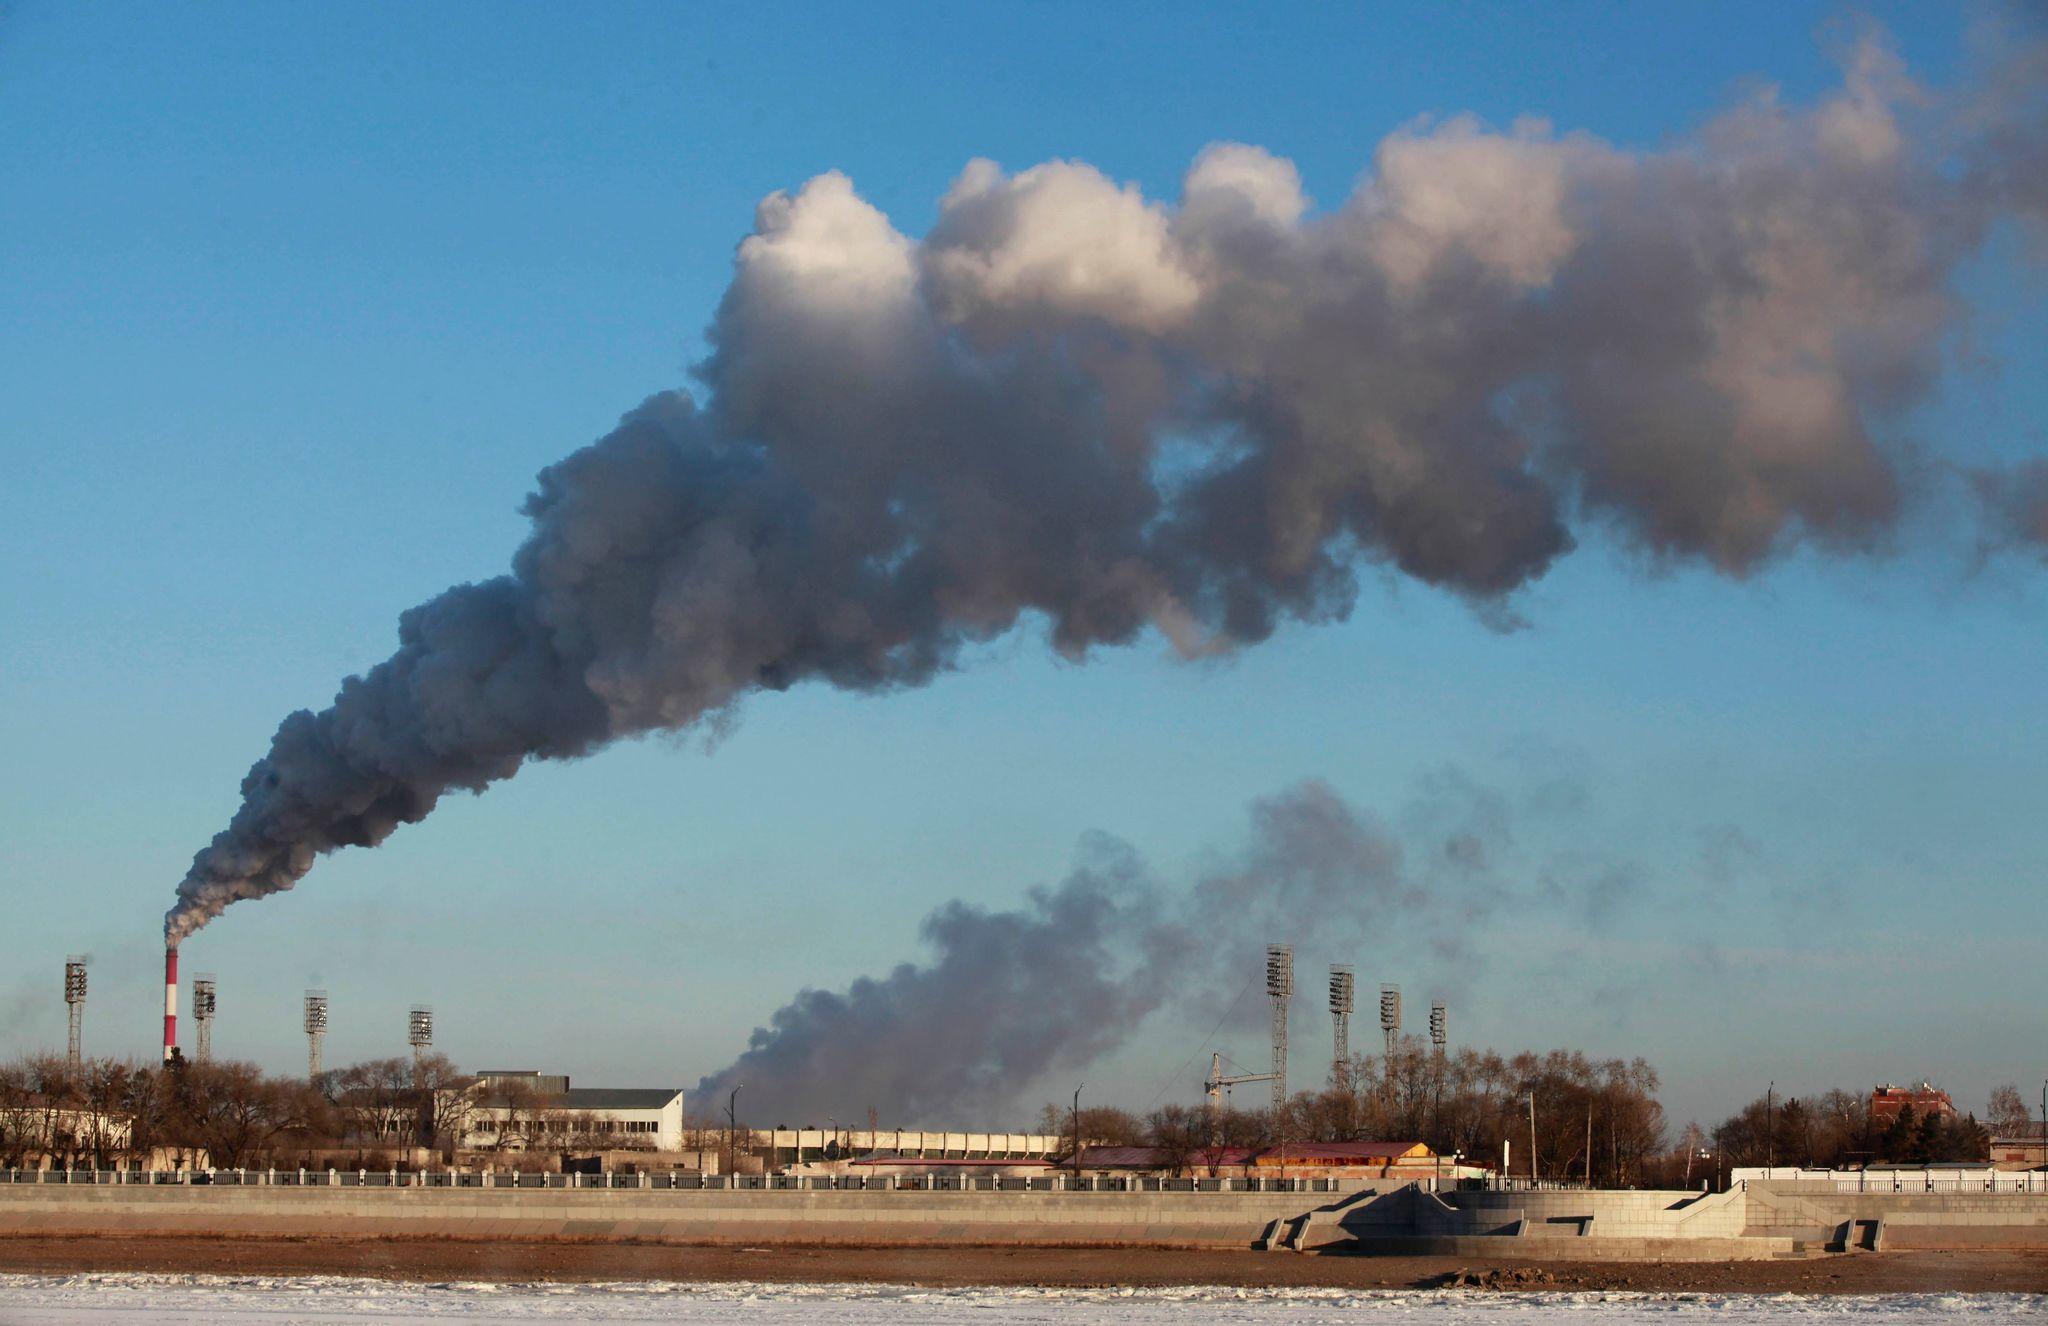 2016 set to break heat record despite slowdown in emissions - Chicago Tribune